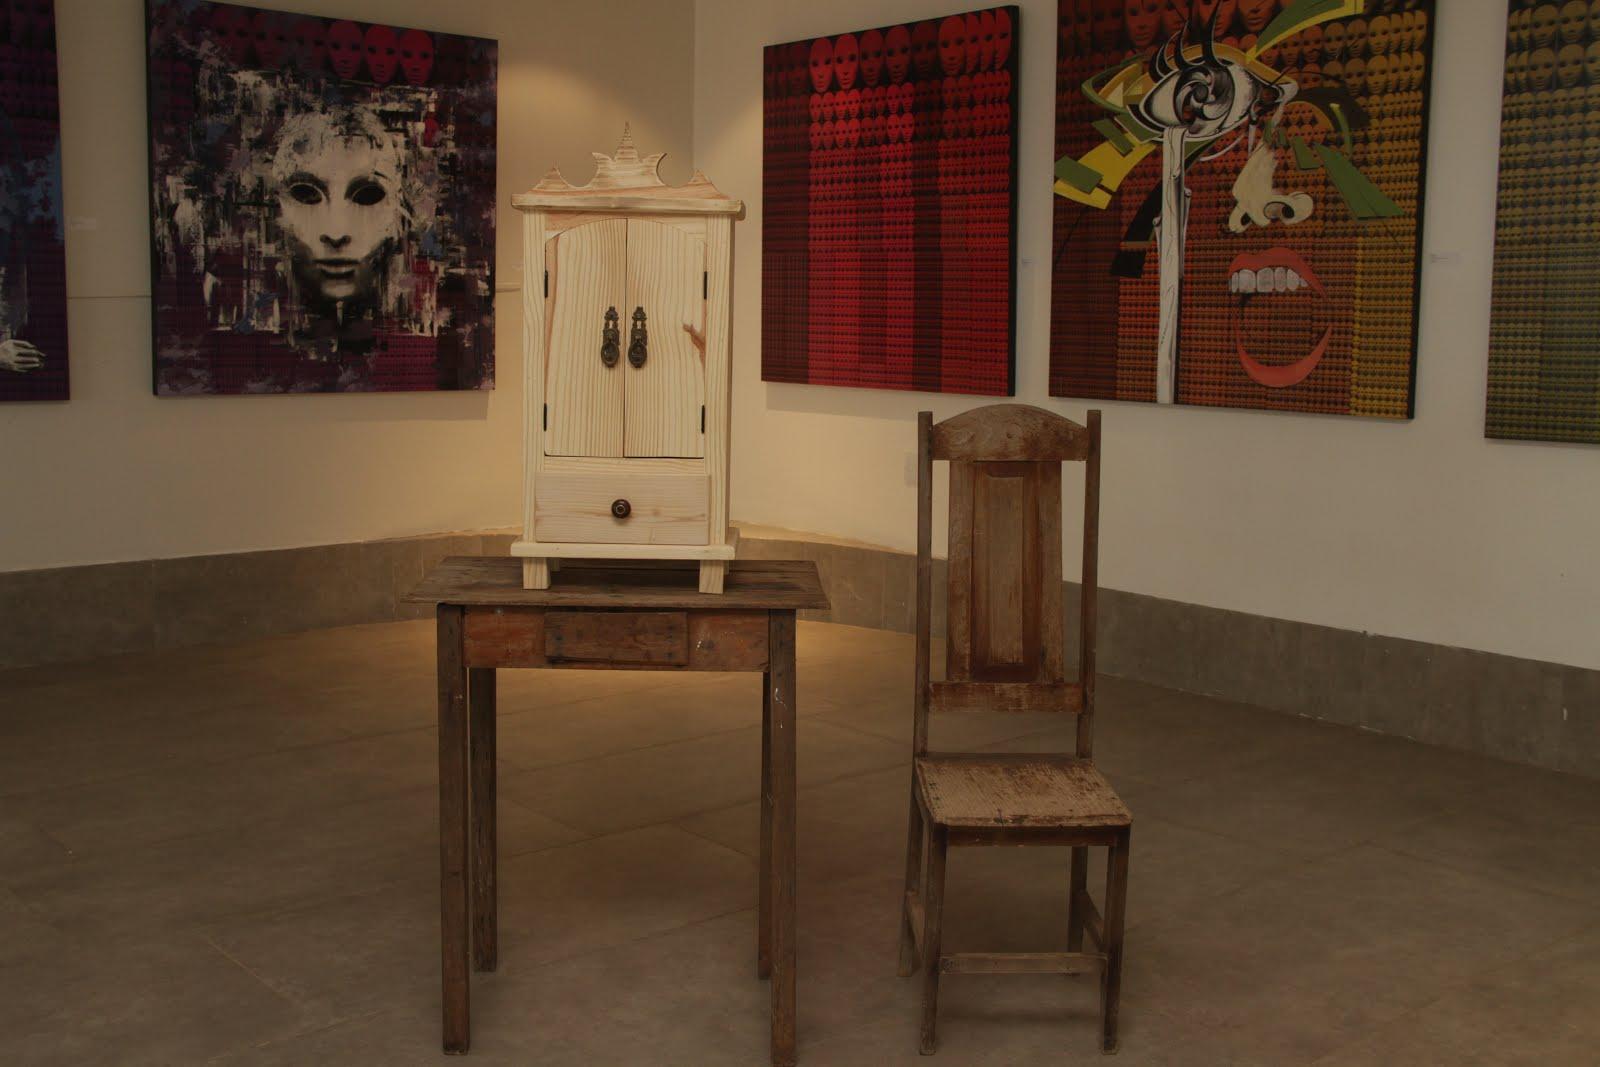 Solange Alves, Objeto de Arte - Feedback (Fechado)